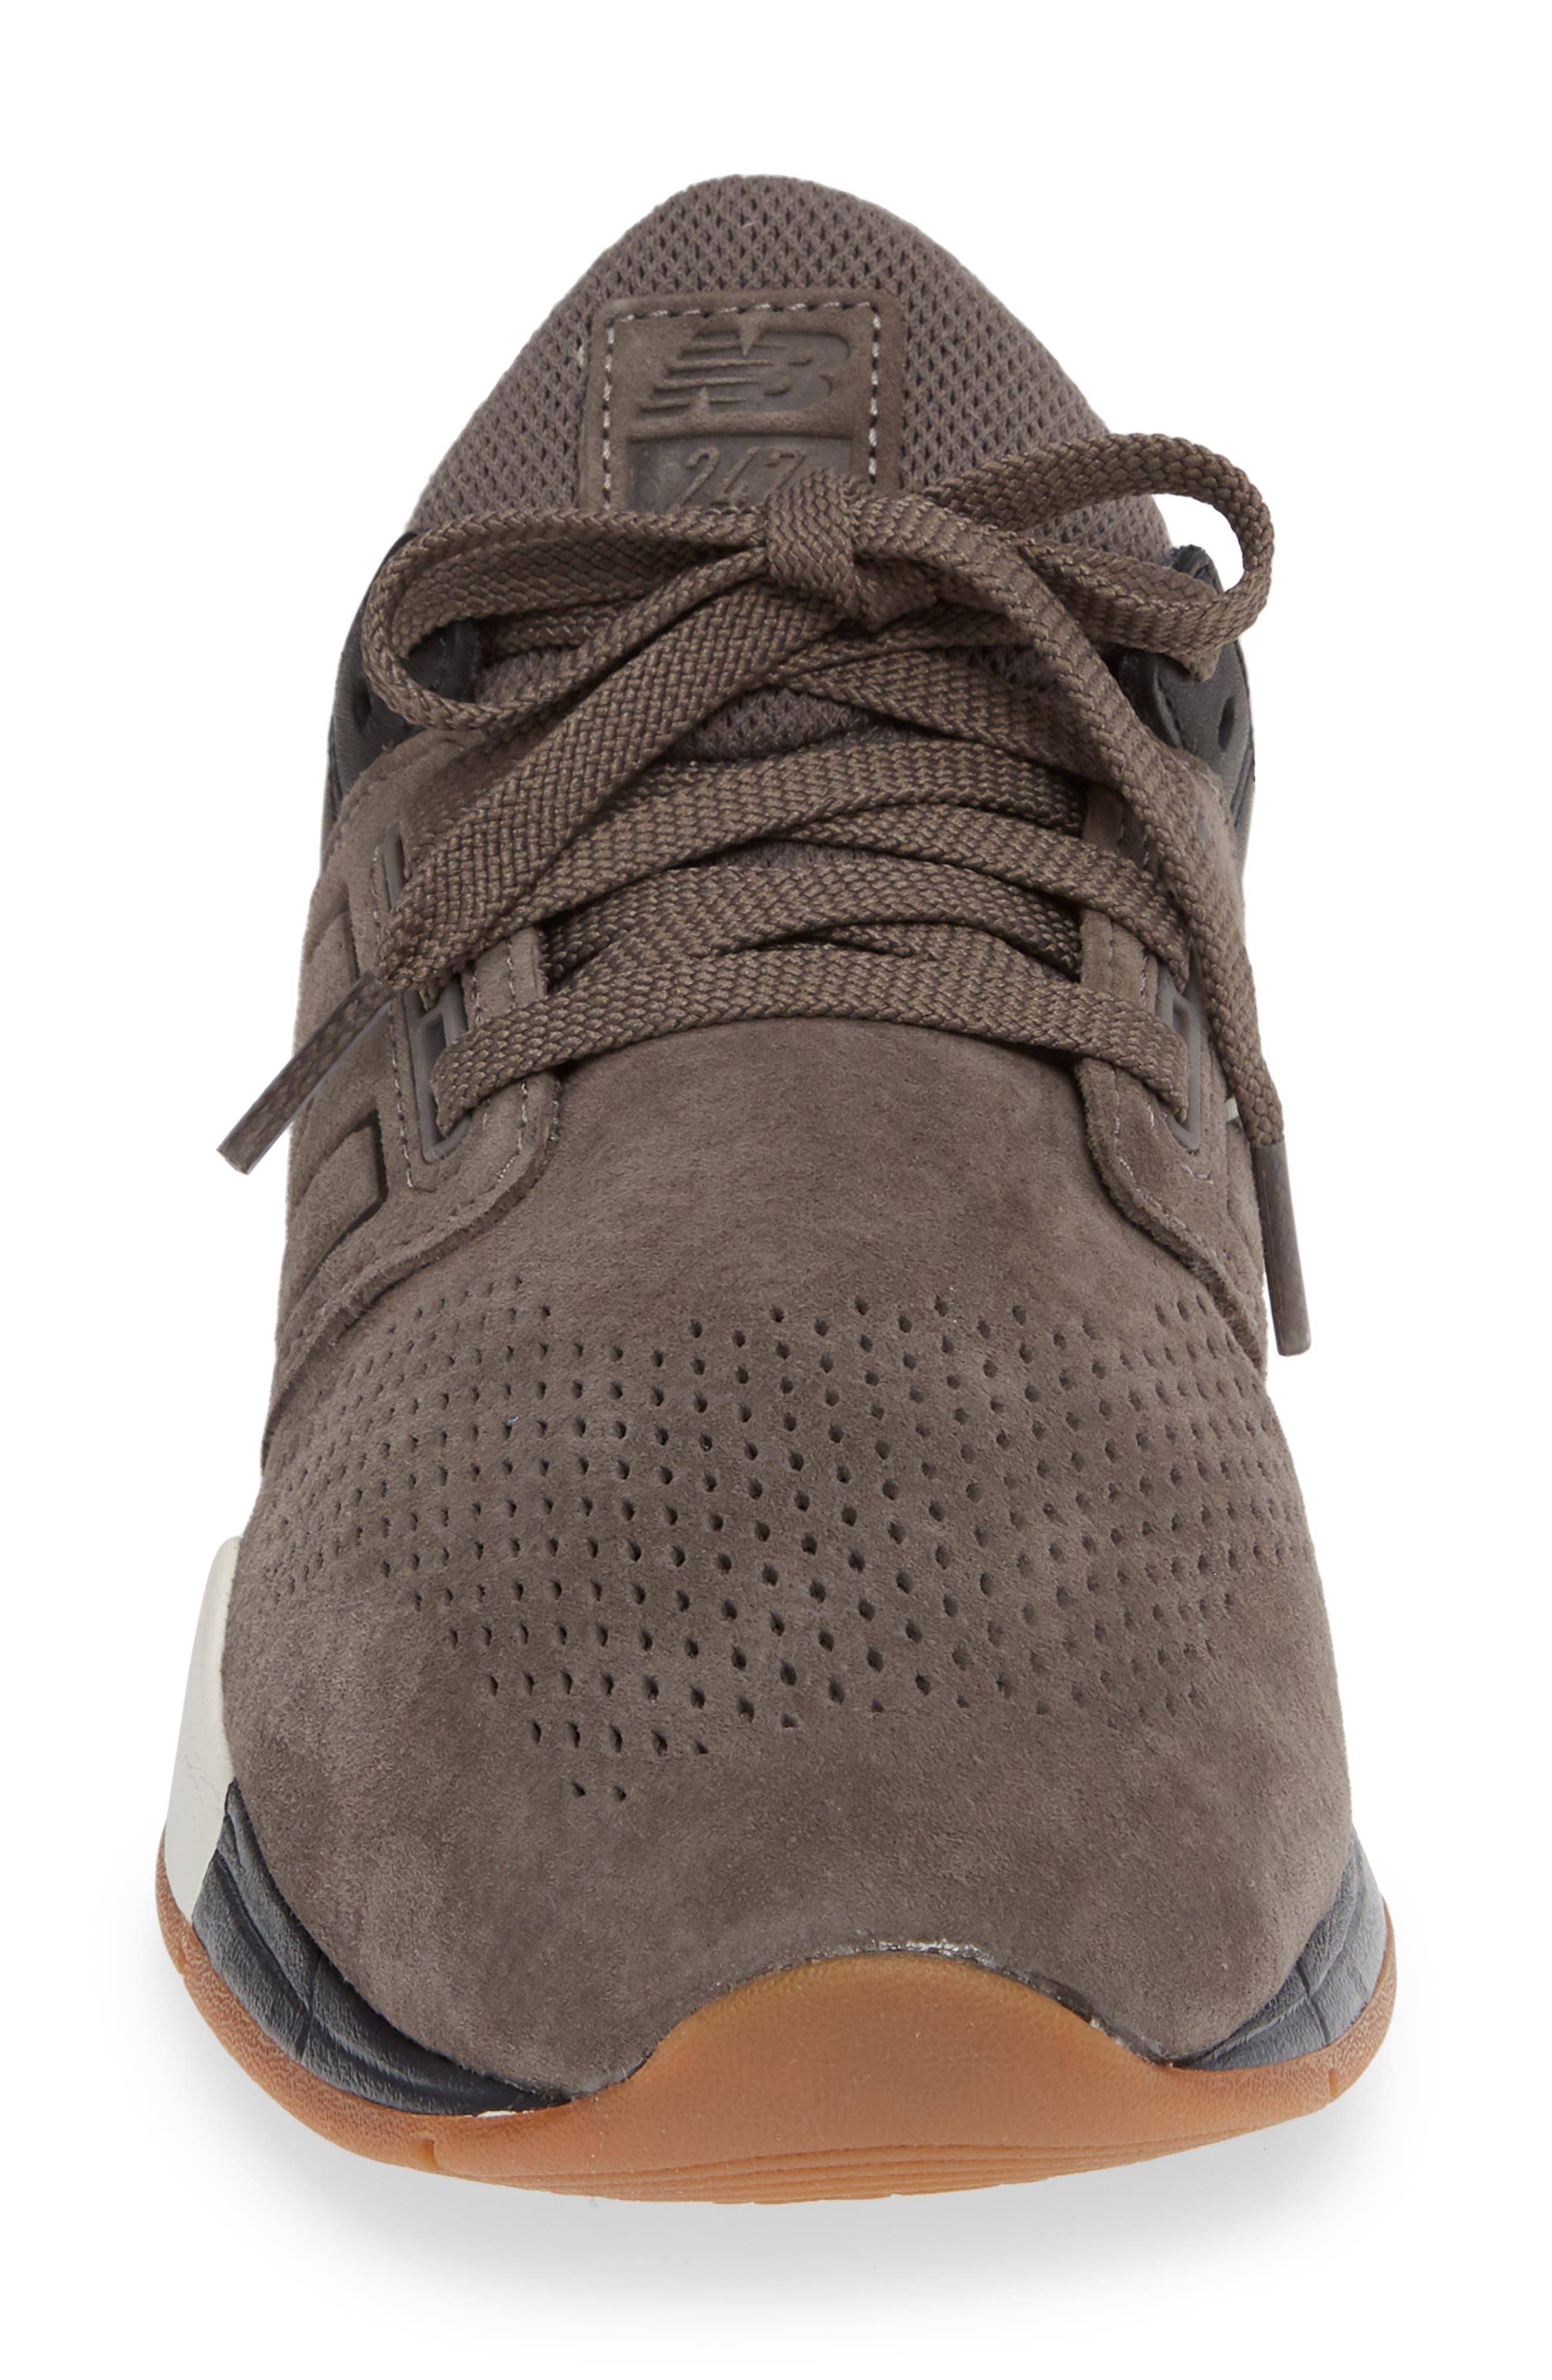 247v2 Sneaker,                             Alternate thumbnail 4, color,                             DARK GREY NUBUCK LEATHER